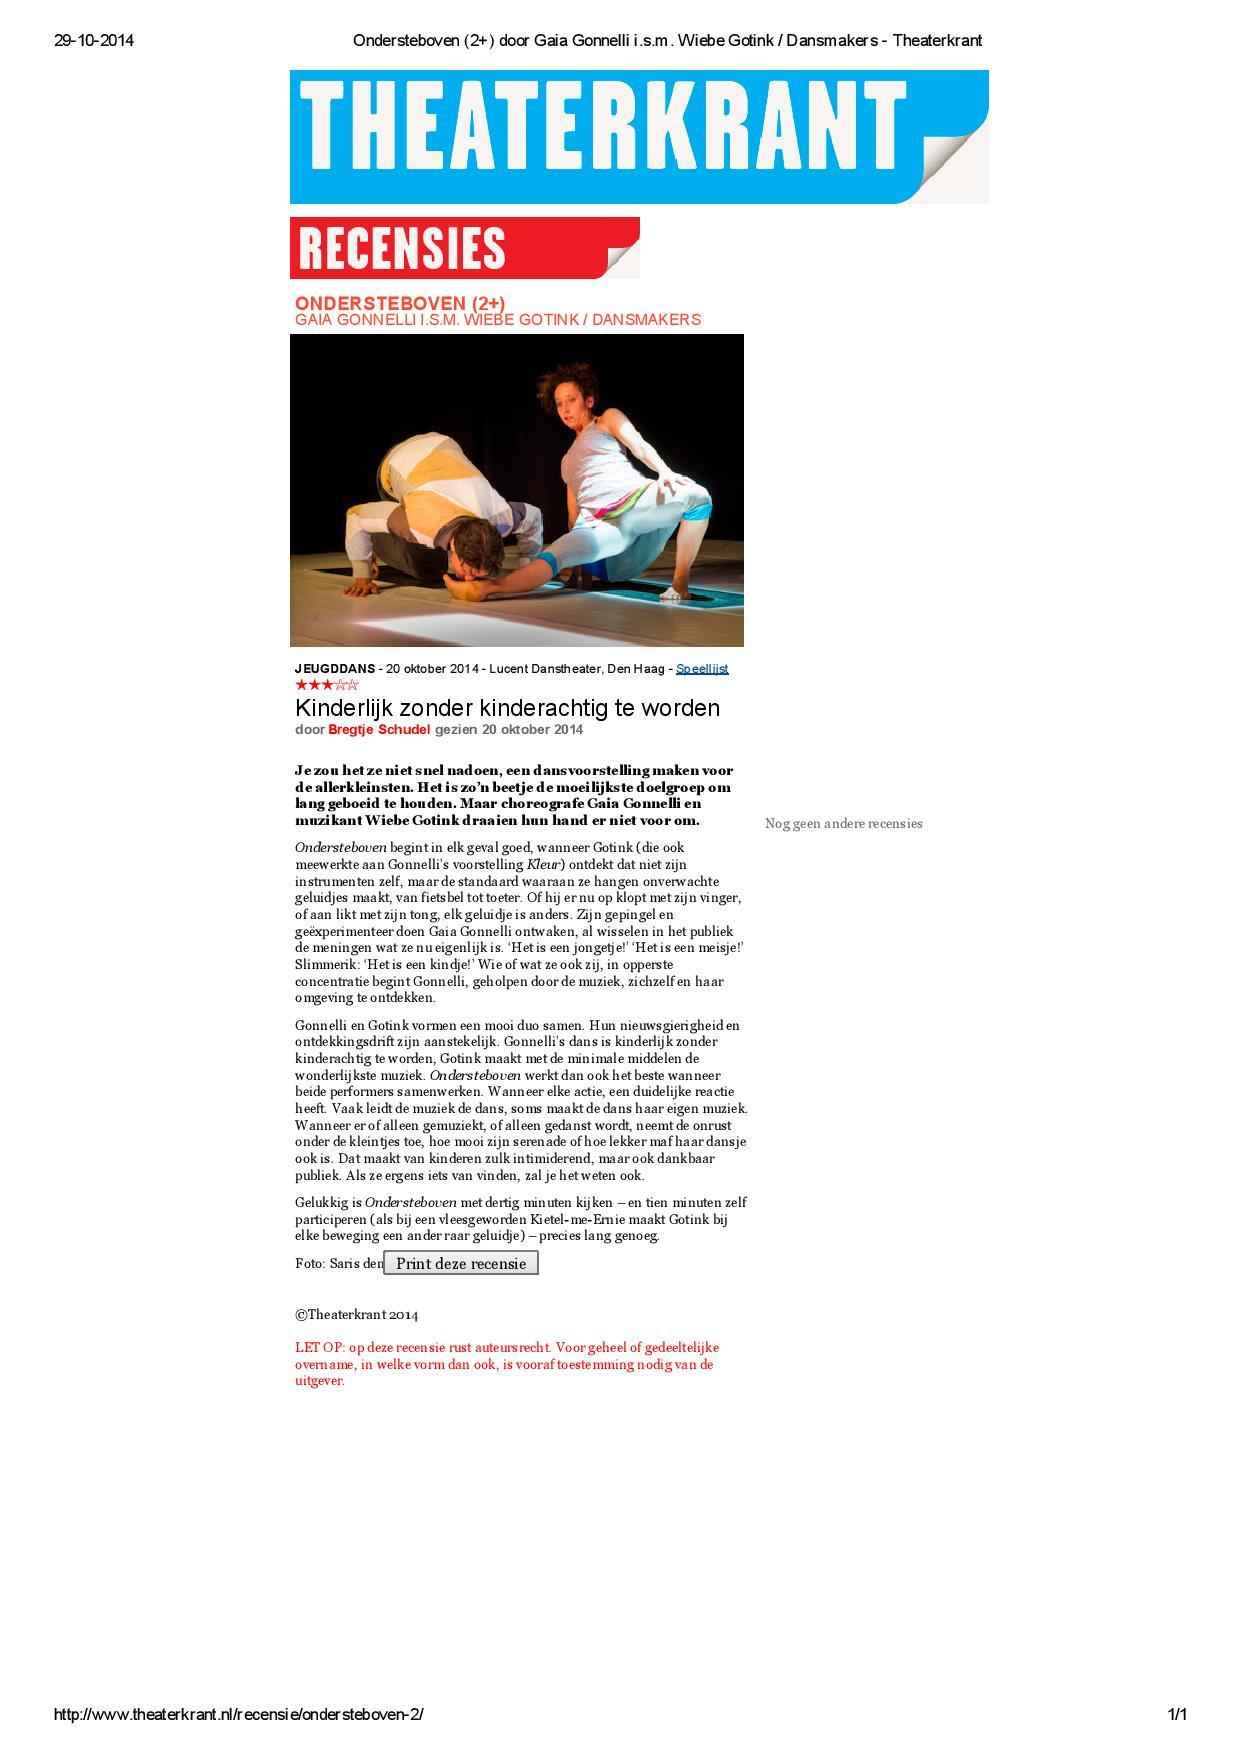 Recensie Ondersteboven - Theaterkrant - 20 okt. 2014